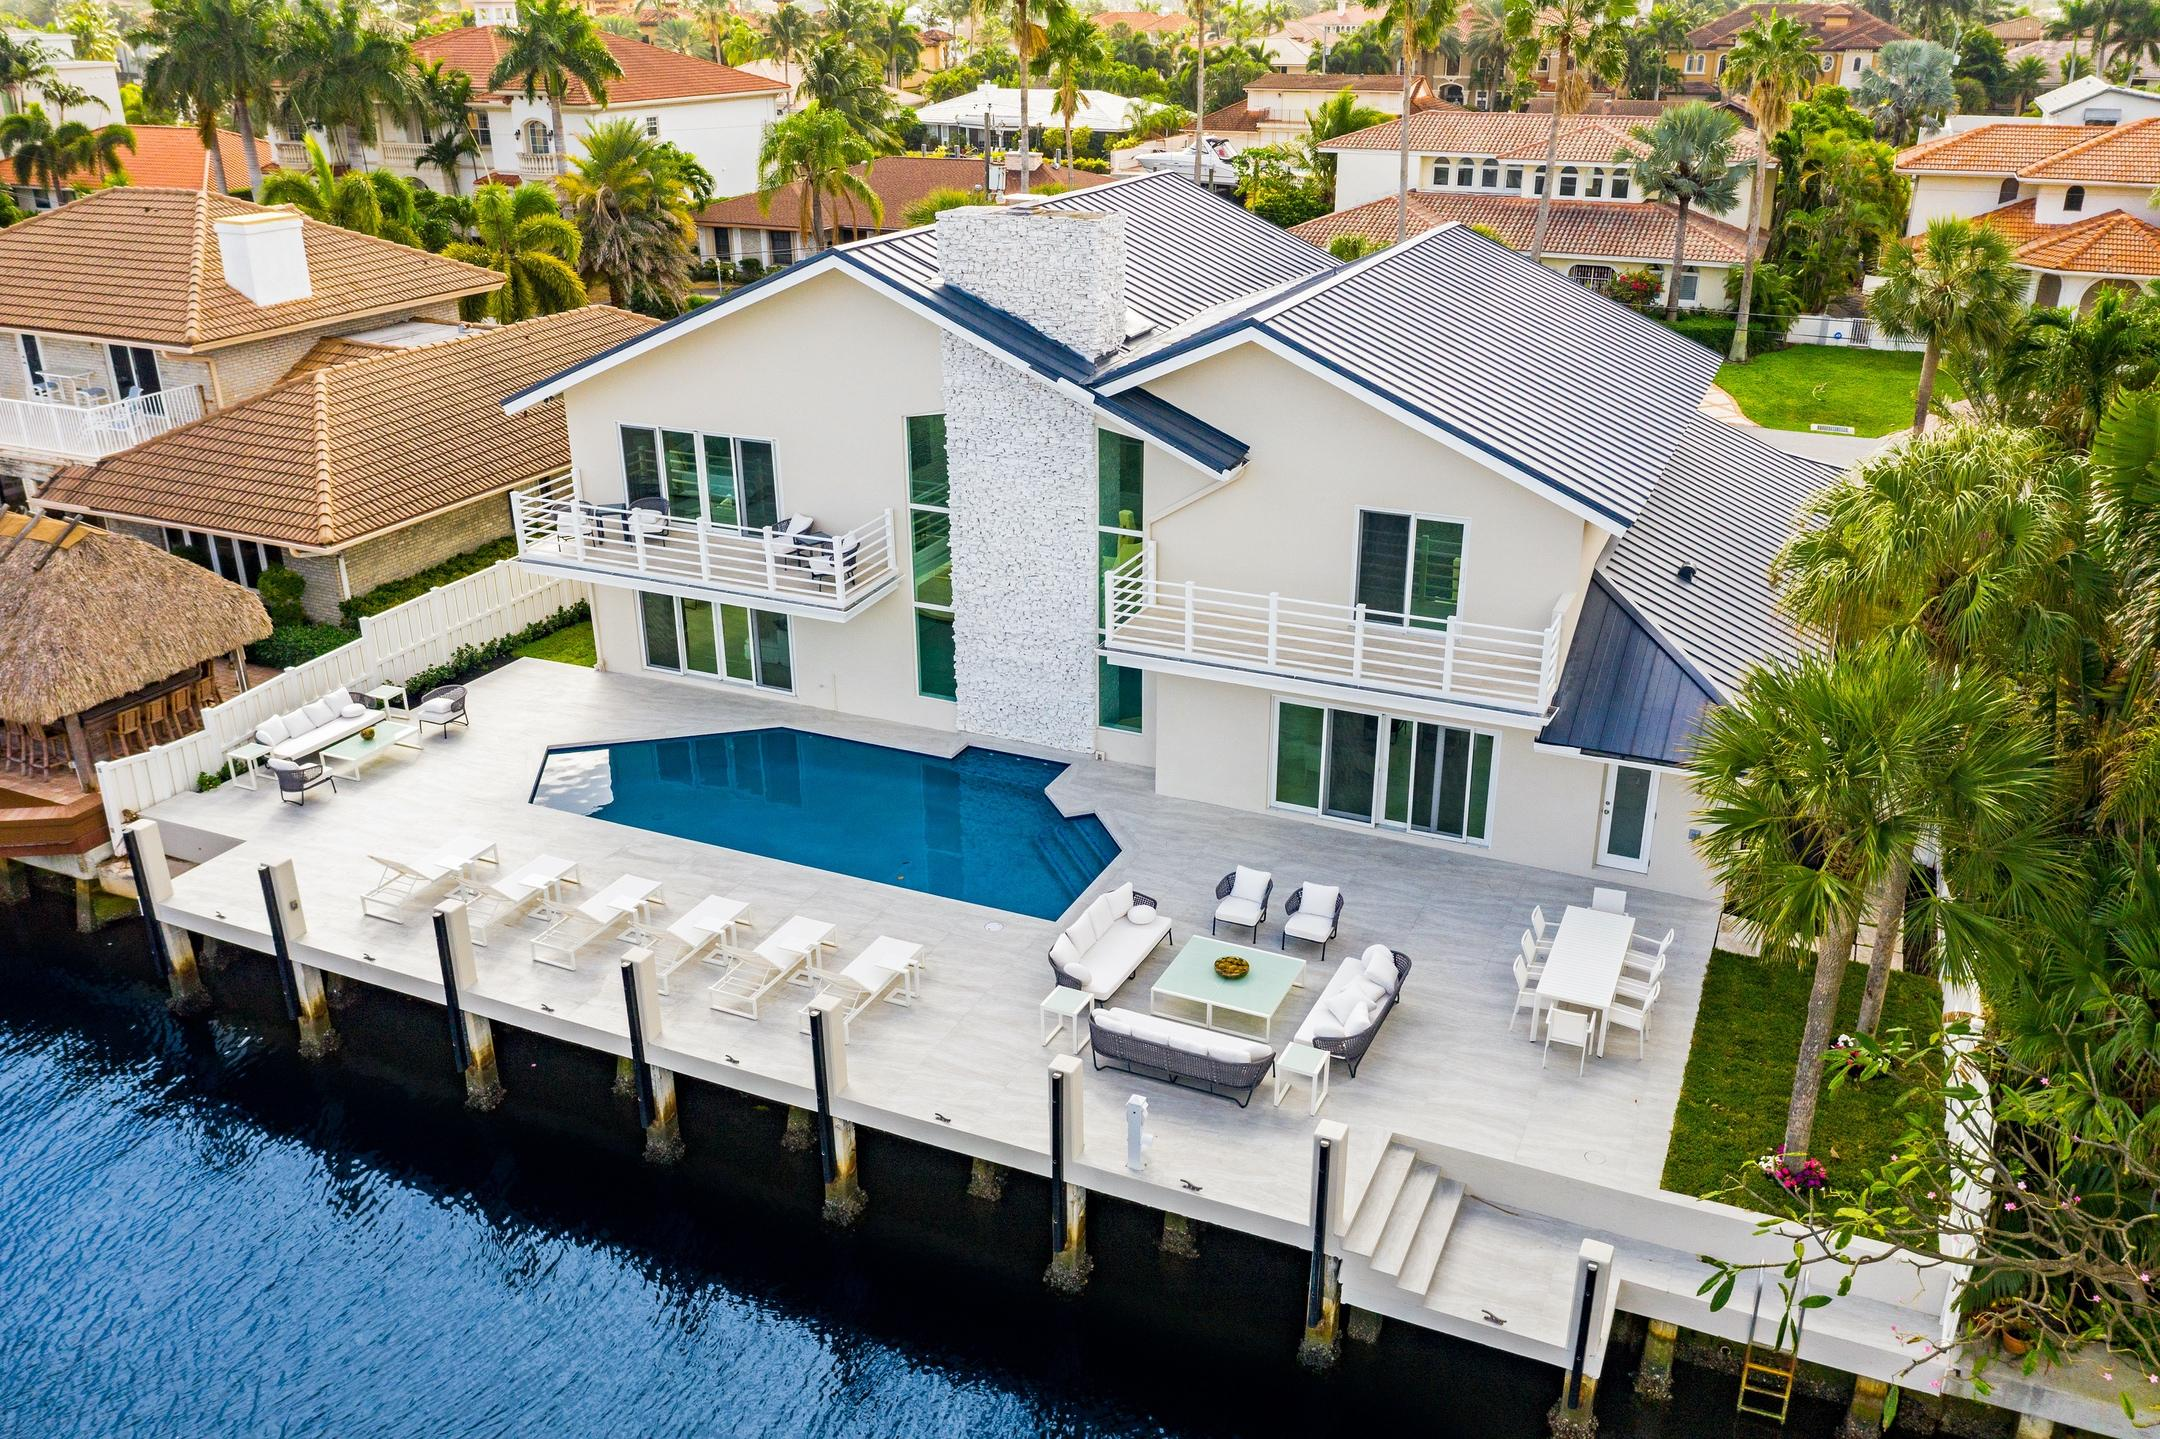 943 Fern Drive - Delray Beach, Florida